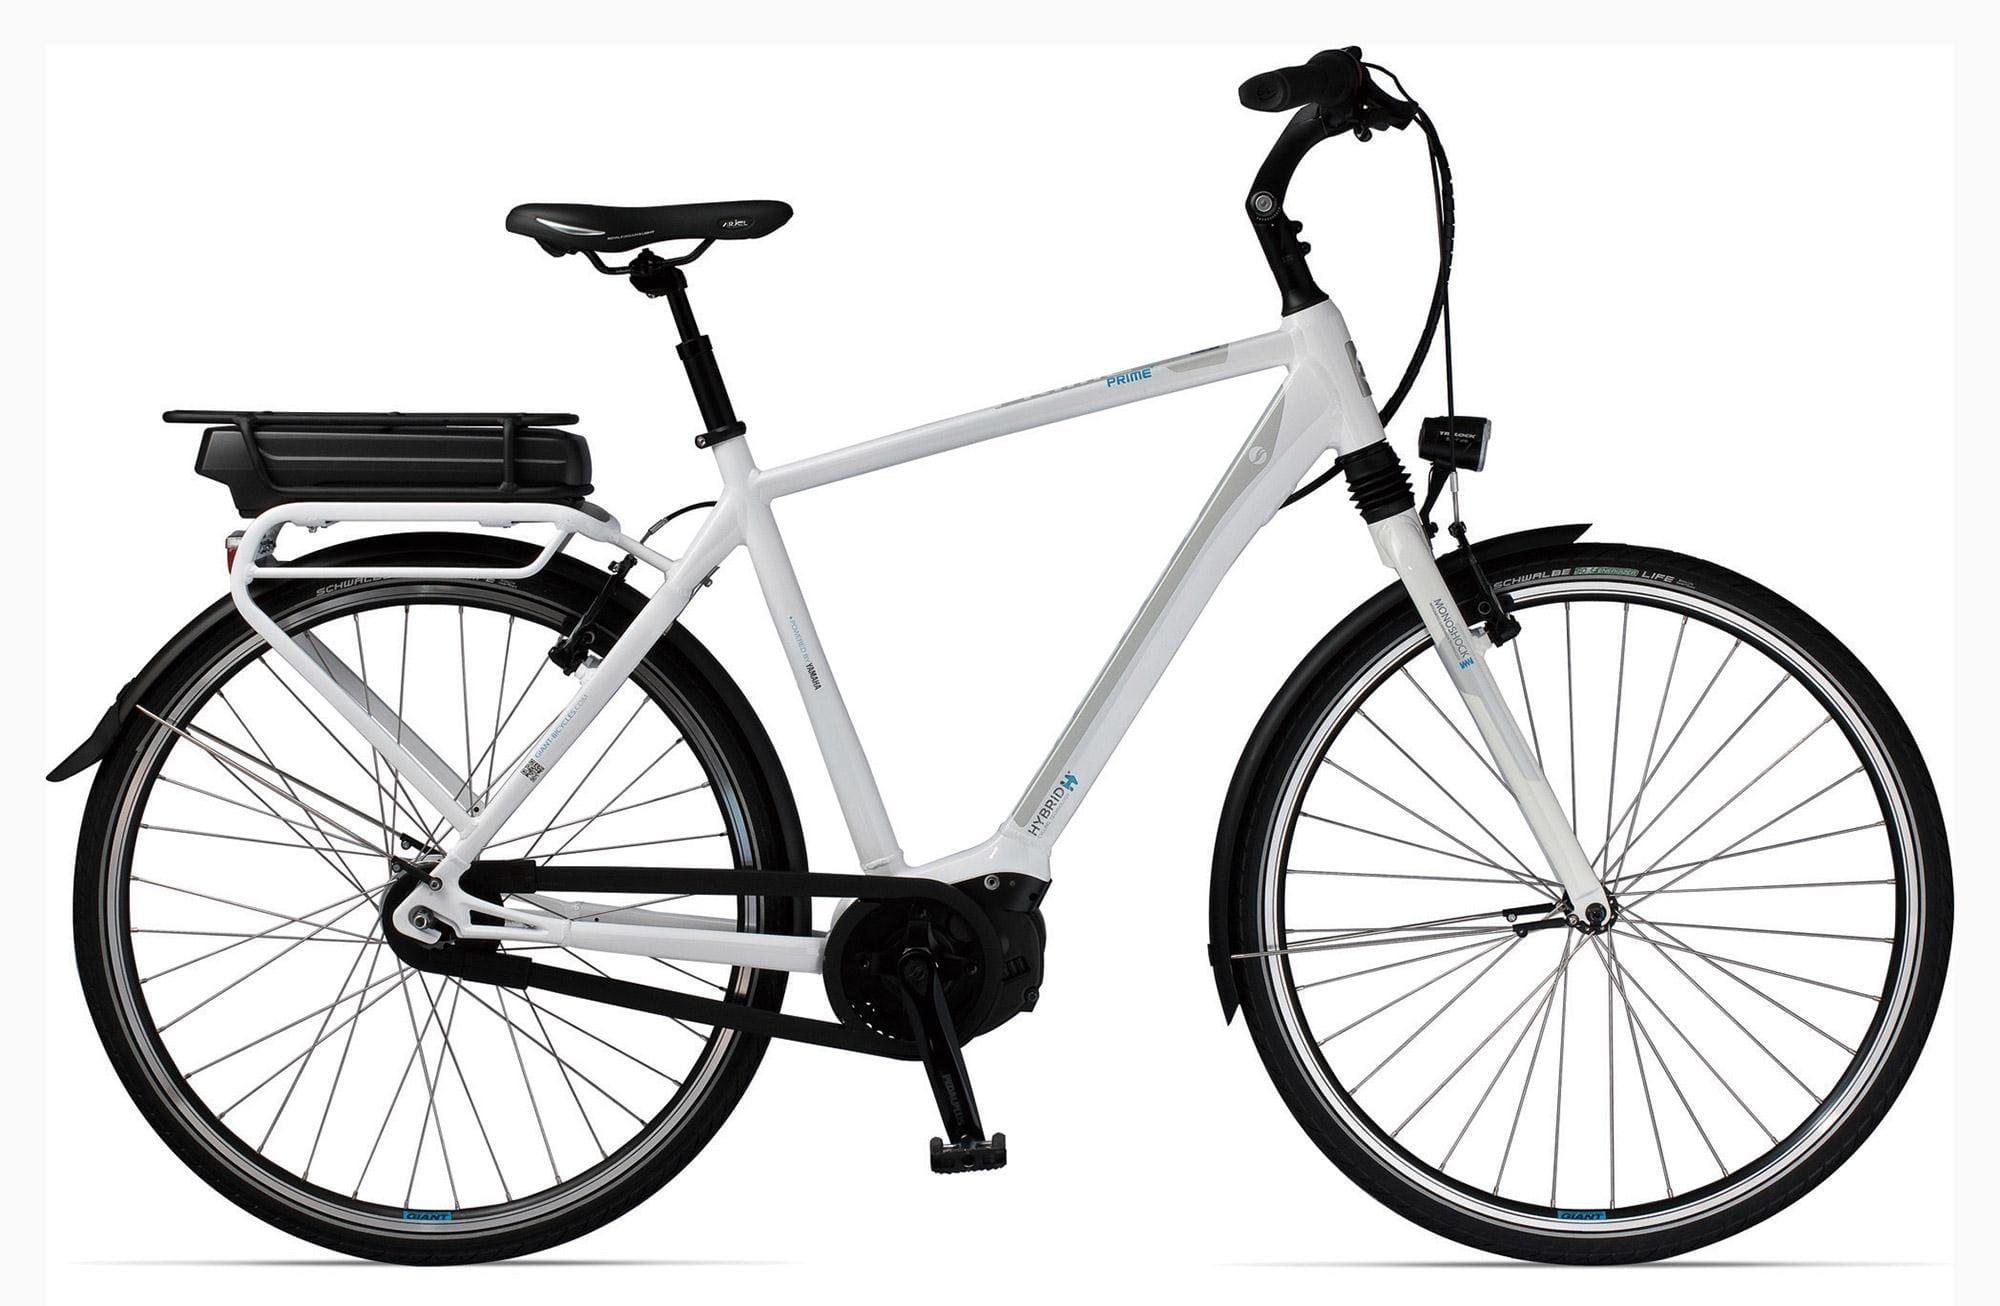 Giant 2014 Prime E 2 Bike All Terrain Cycles